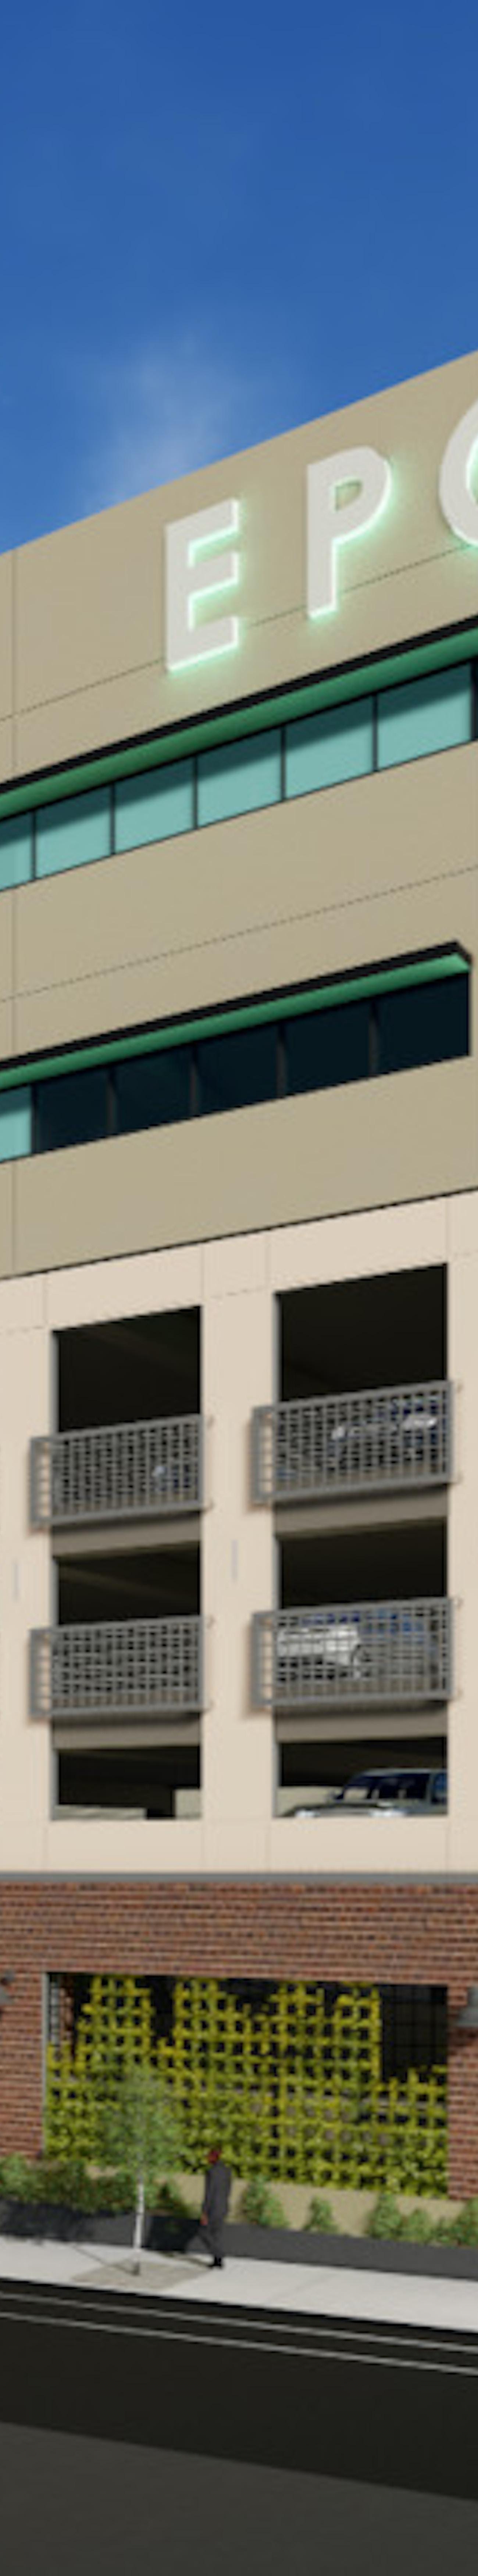 EPCC Rio Grande Campus Academic Classroom And Parking Garage